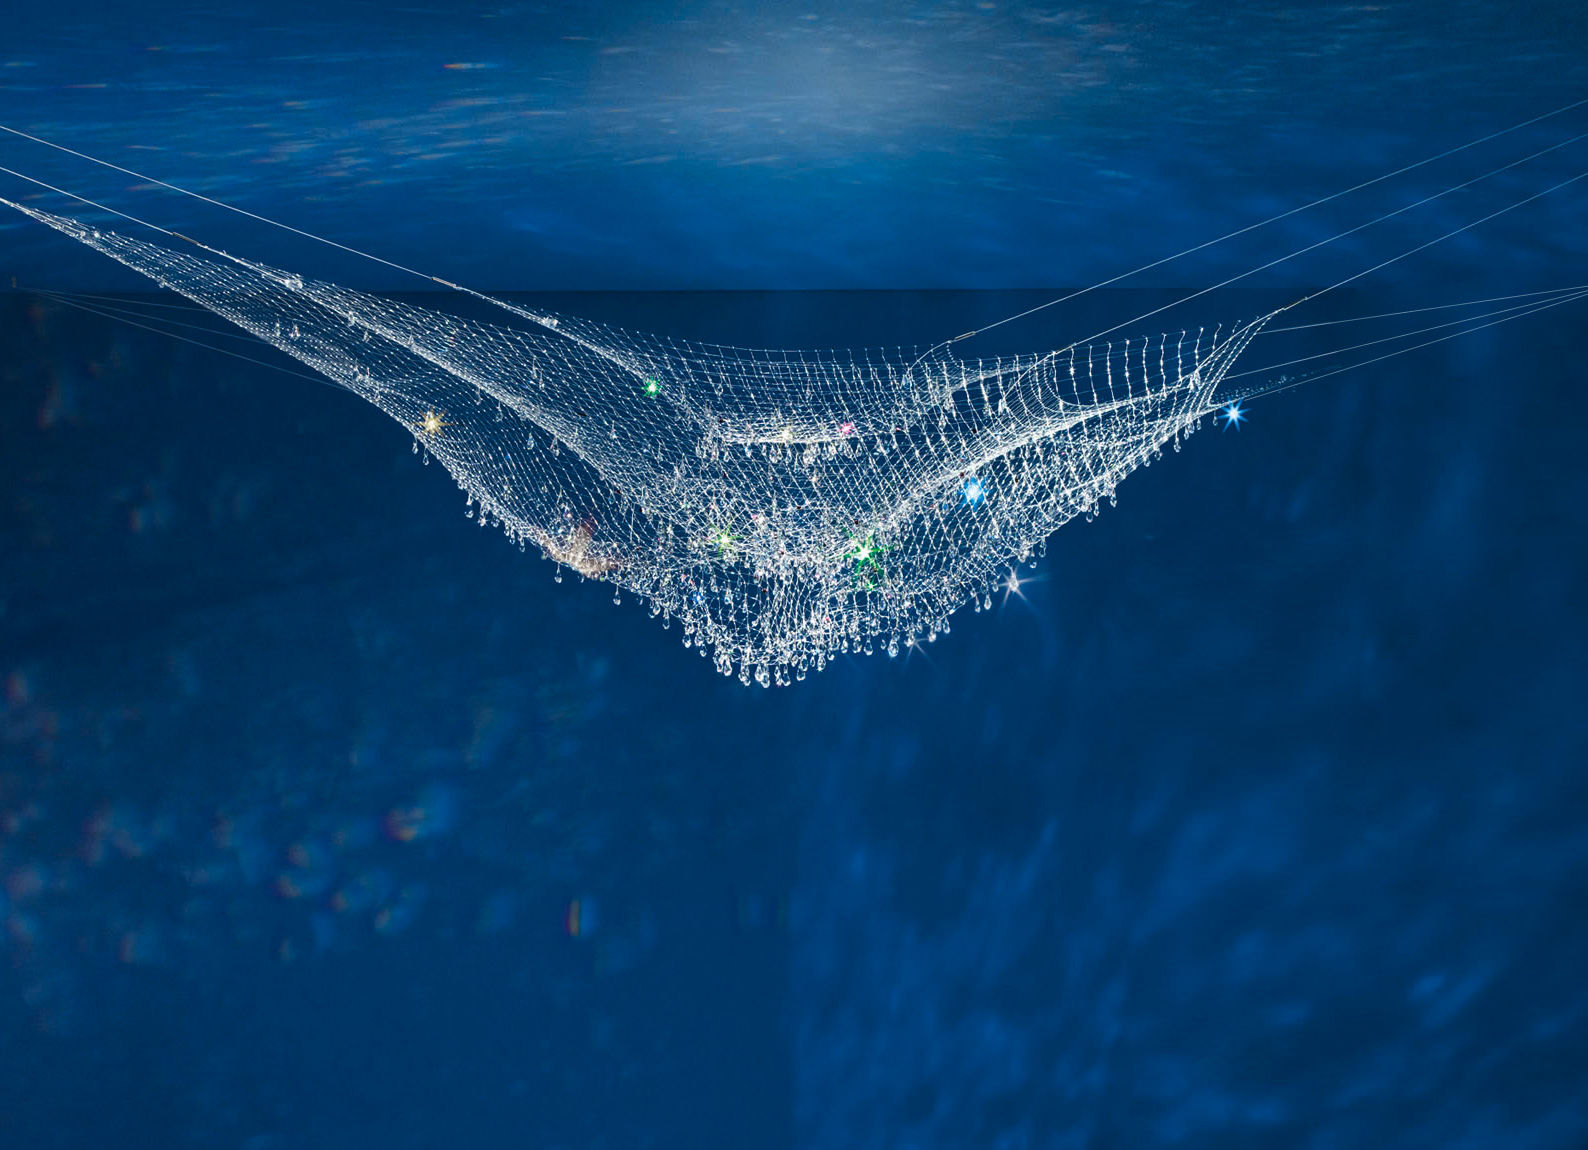 Luminaire - Suspensions - Suspension Lacrime del Pescatore - Ingo Maurer - Multicolore - Cristal, Nylon